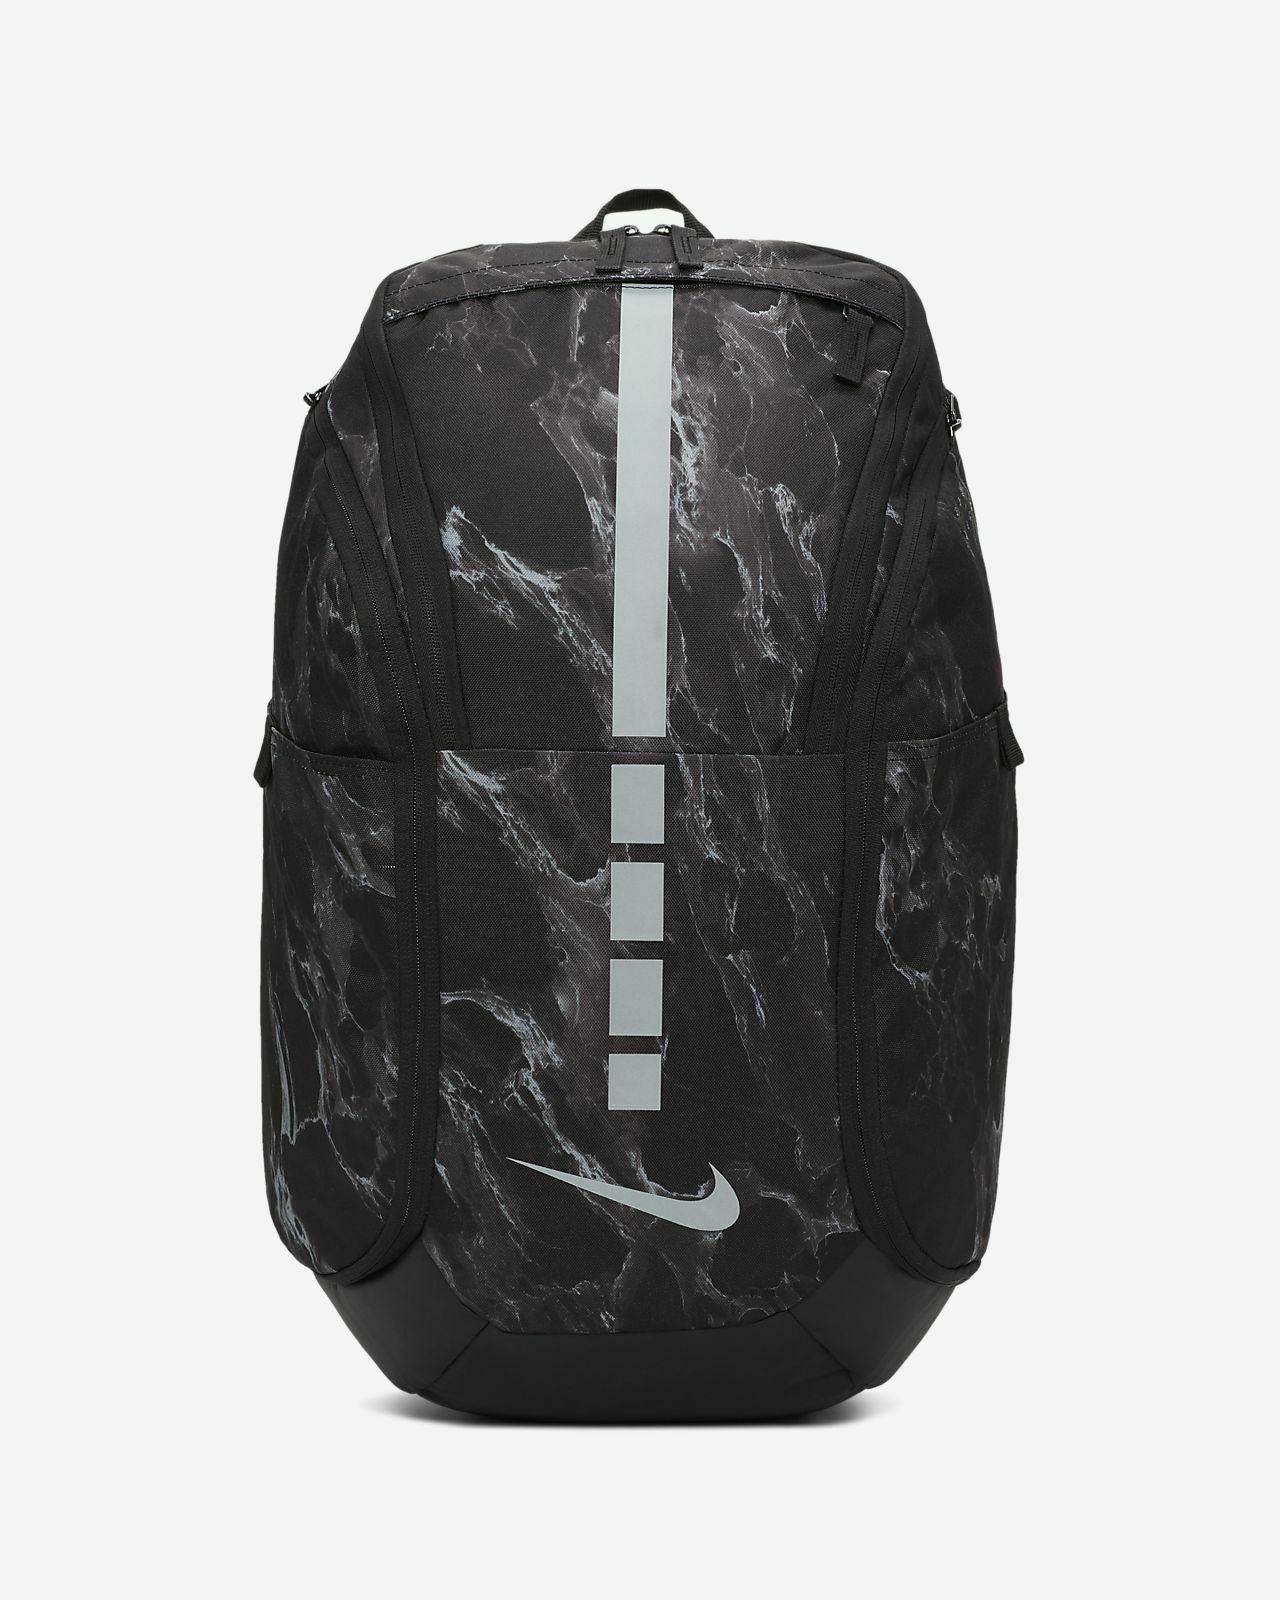 hoops elite pro basketball backpack nwt brand